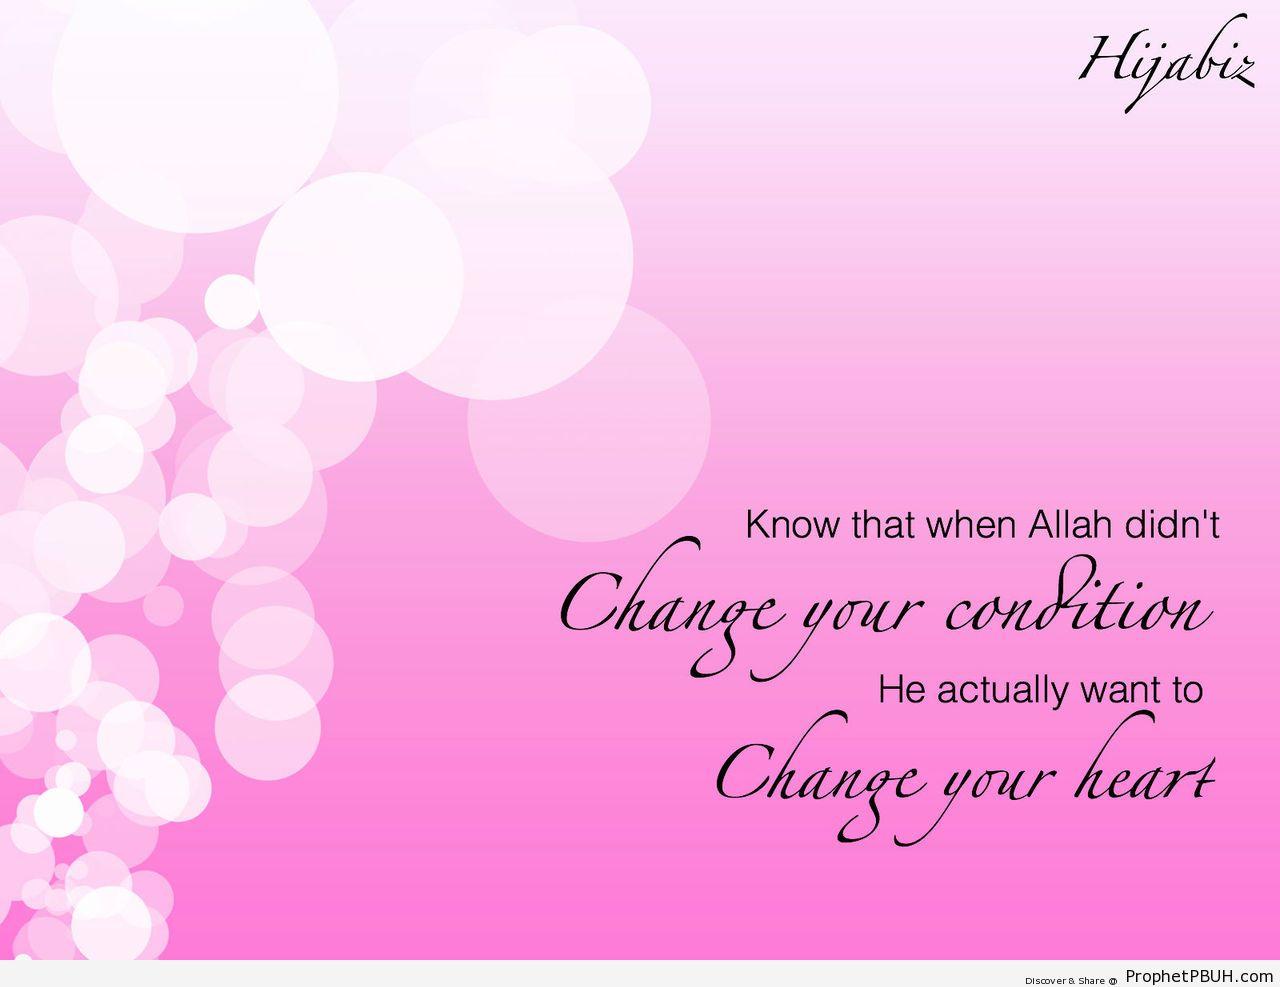 Ponder back again and again why Allah... - Islamic Quotes, Hadiths, Duas